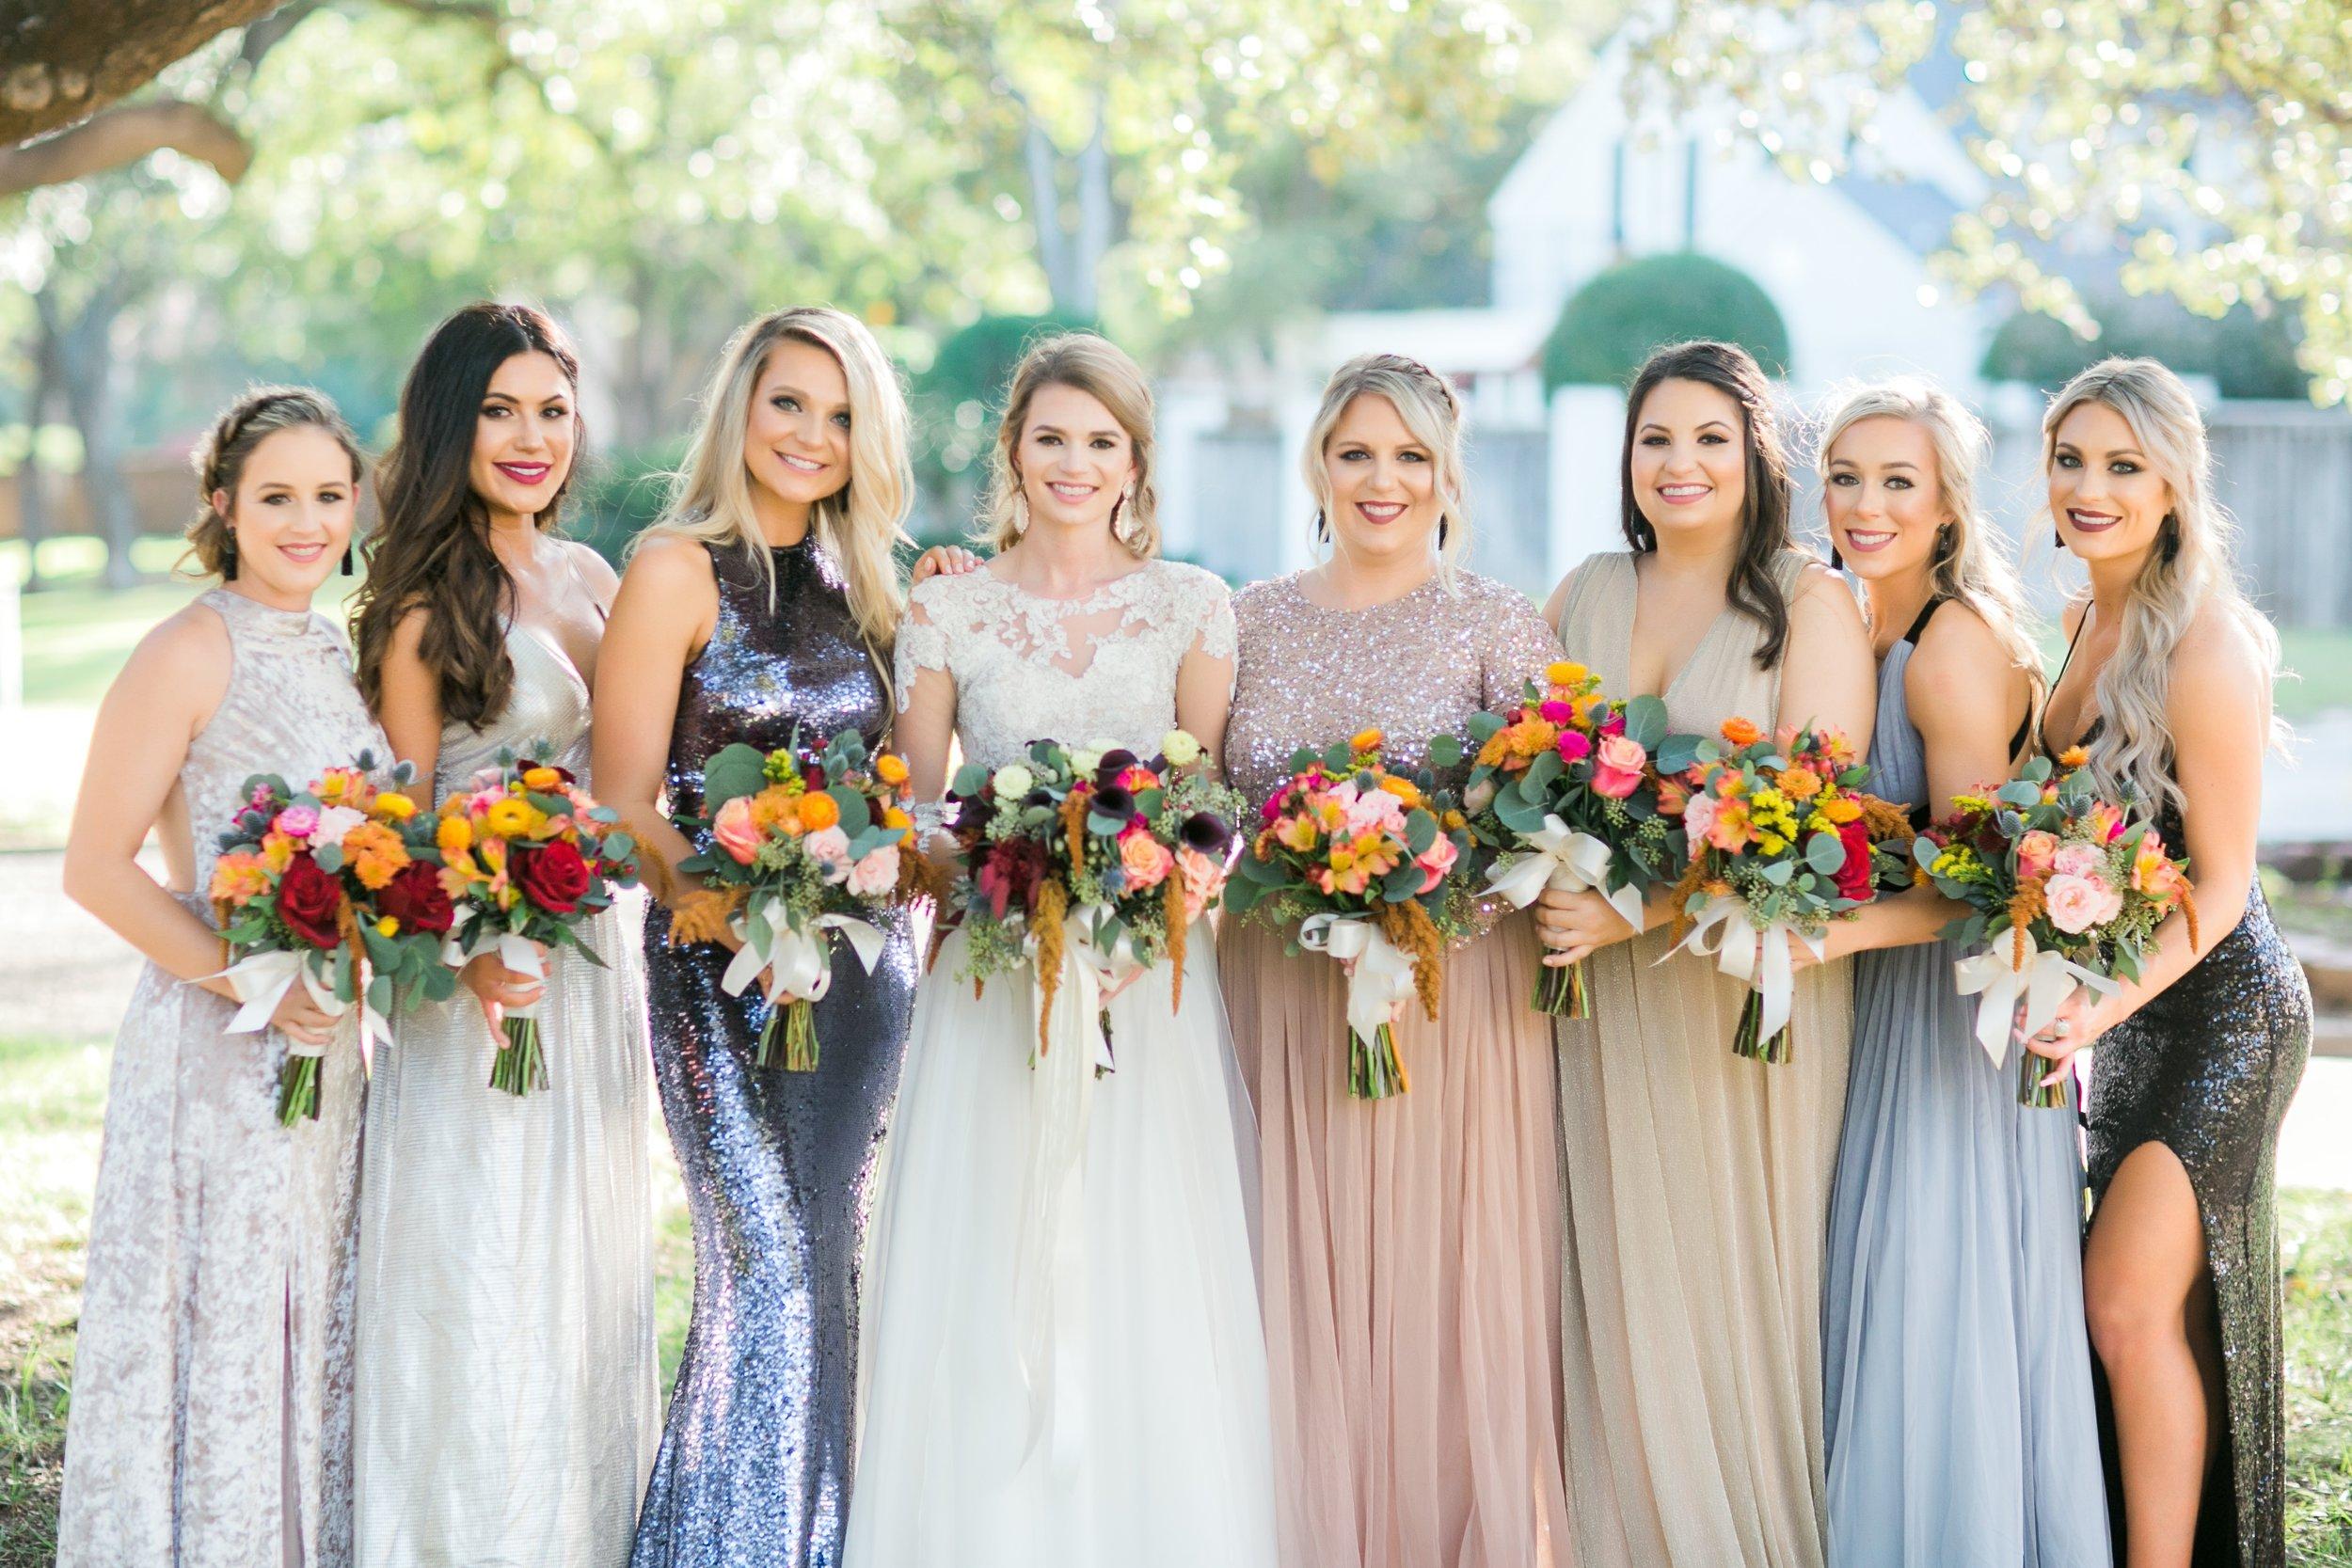 Roberson-Wedding-The-Forum-Lauren-Pinson-Wedding-Photography-Wichita-Falls-Texas-054.jpg